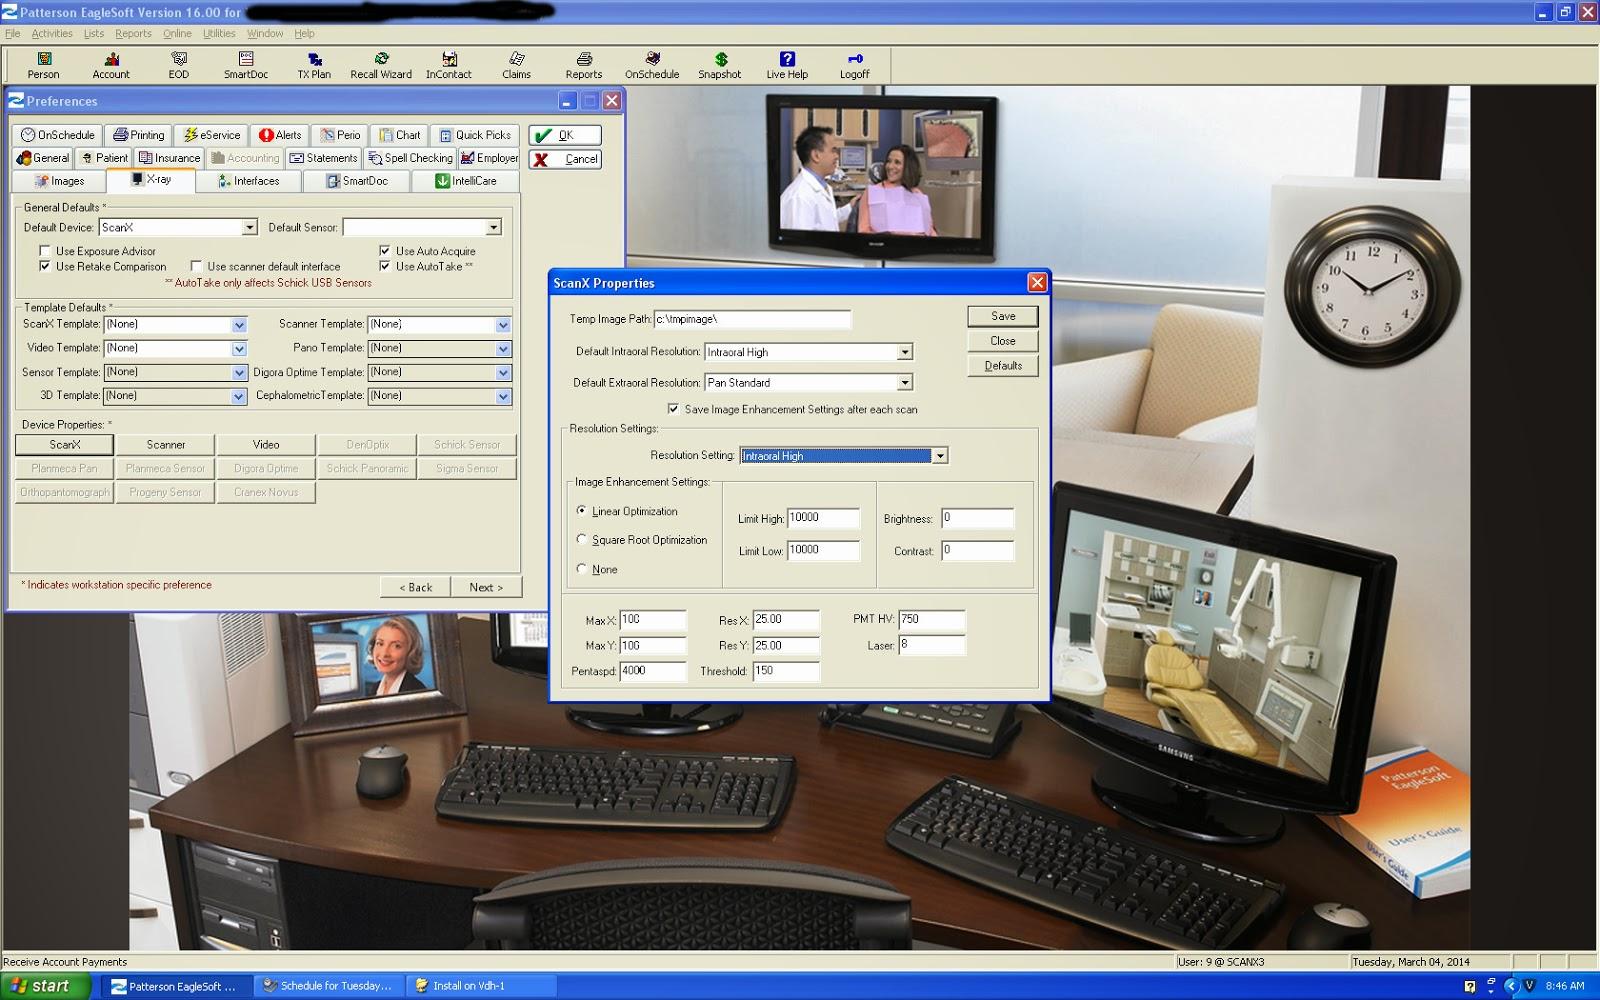 Justin Shafer: Eaglesoft 16 and Scan-X EPP Model (Parallel Port)